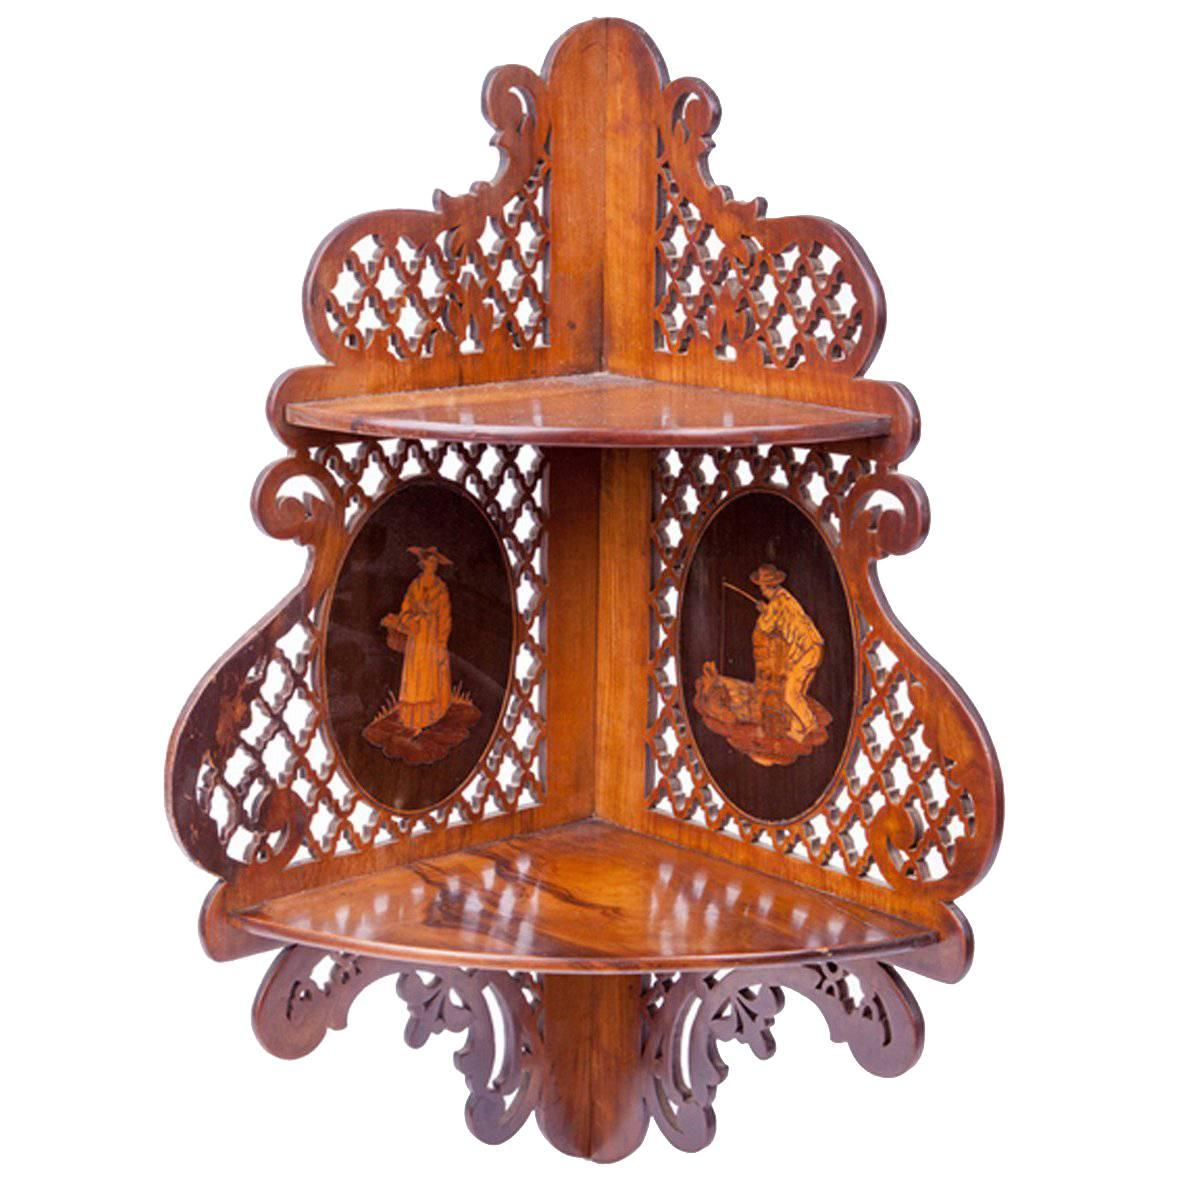 19th Century Mahogany Corner Bracket with Inlaid Vignettes